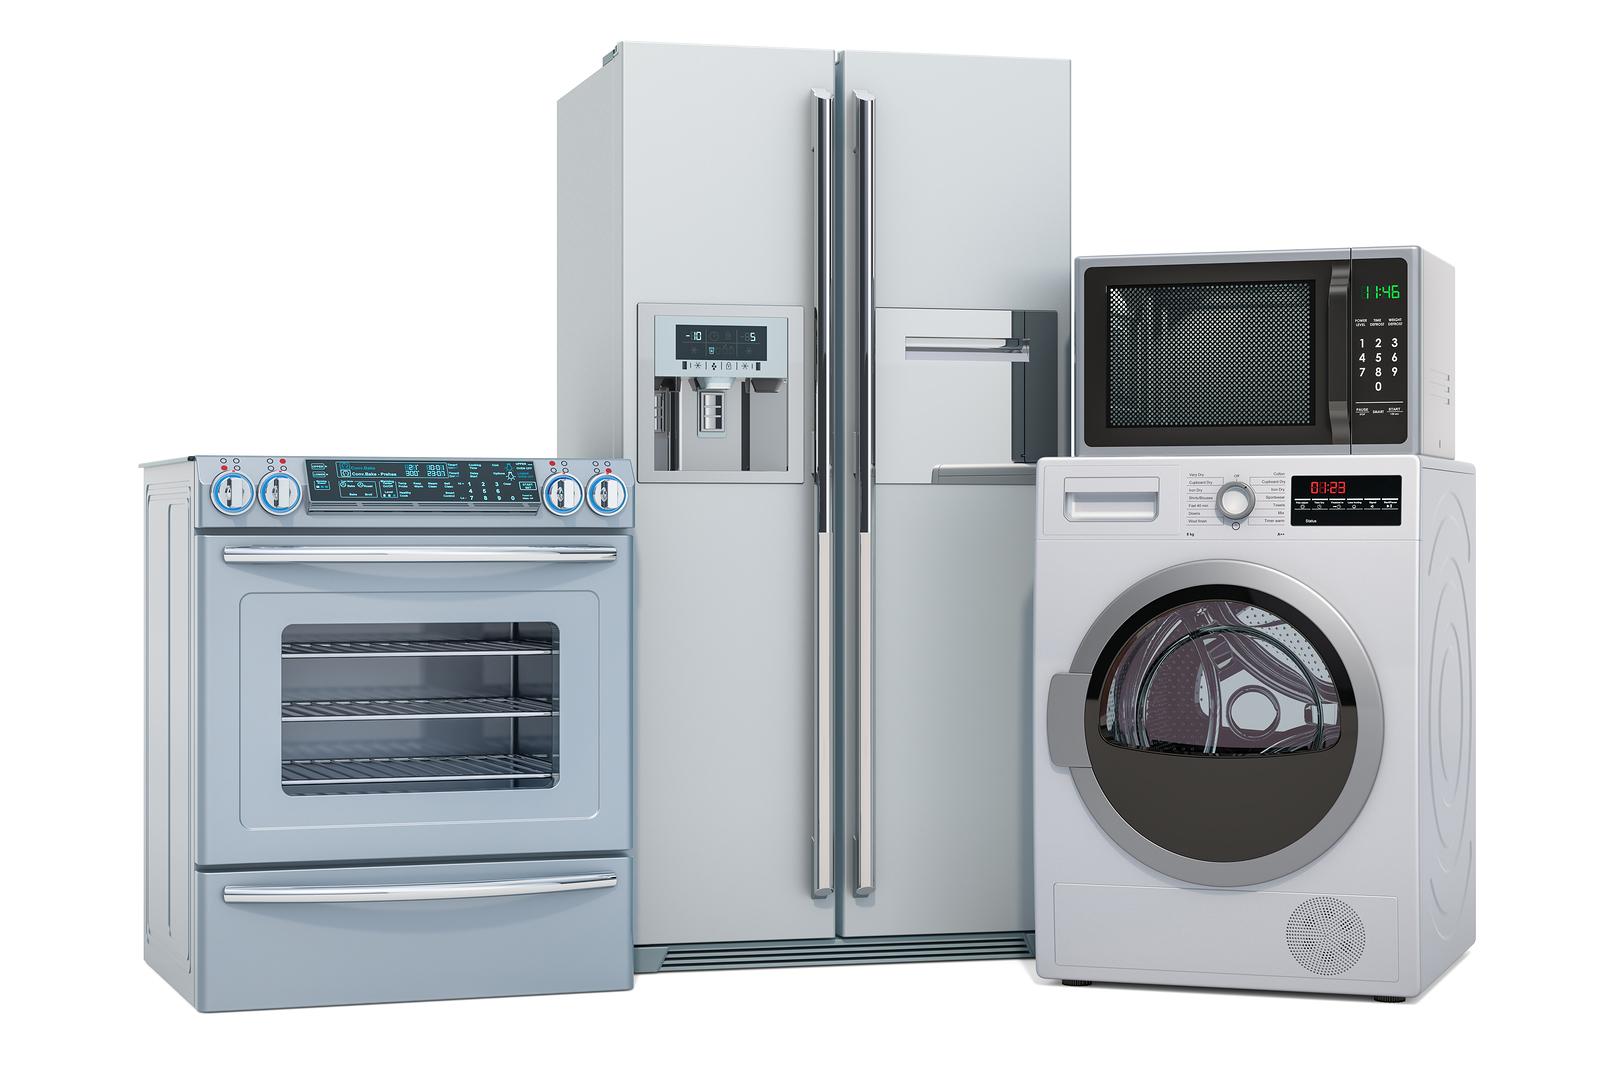 Low energy appliances